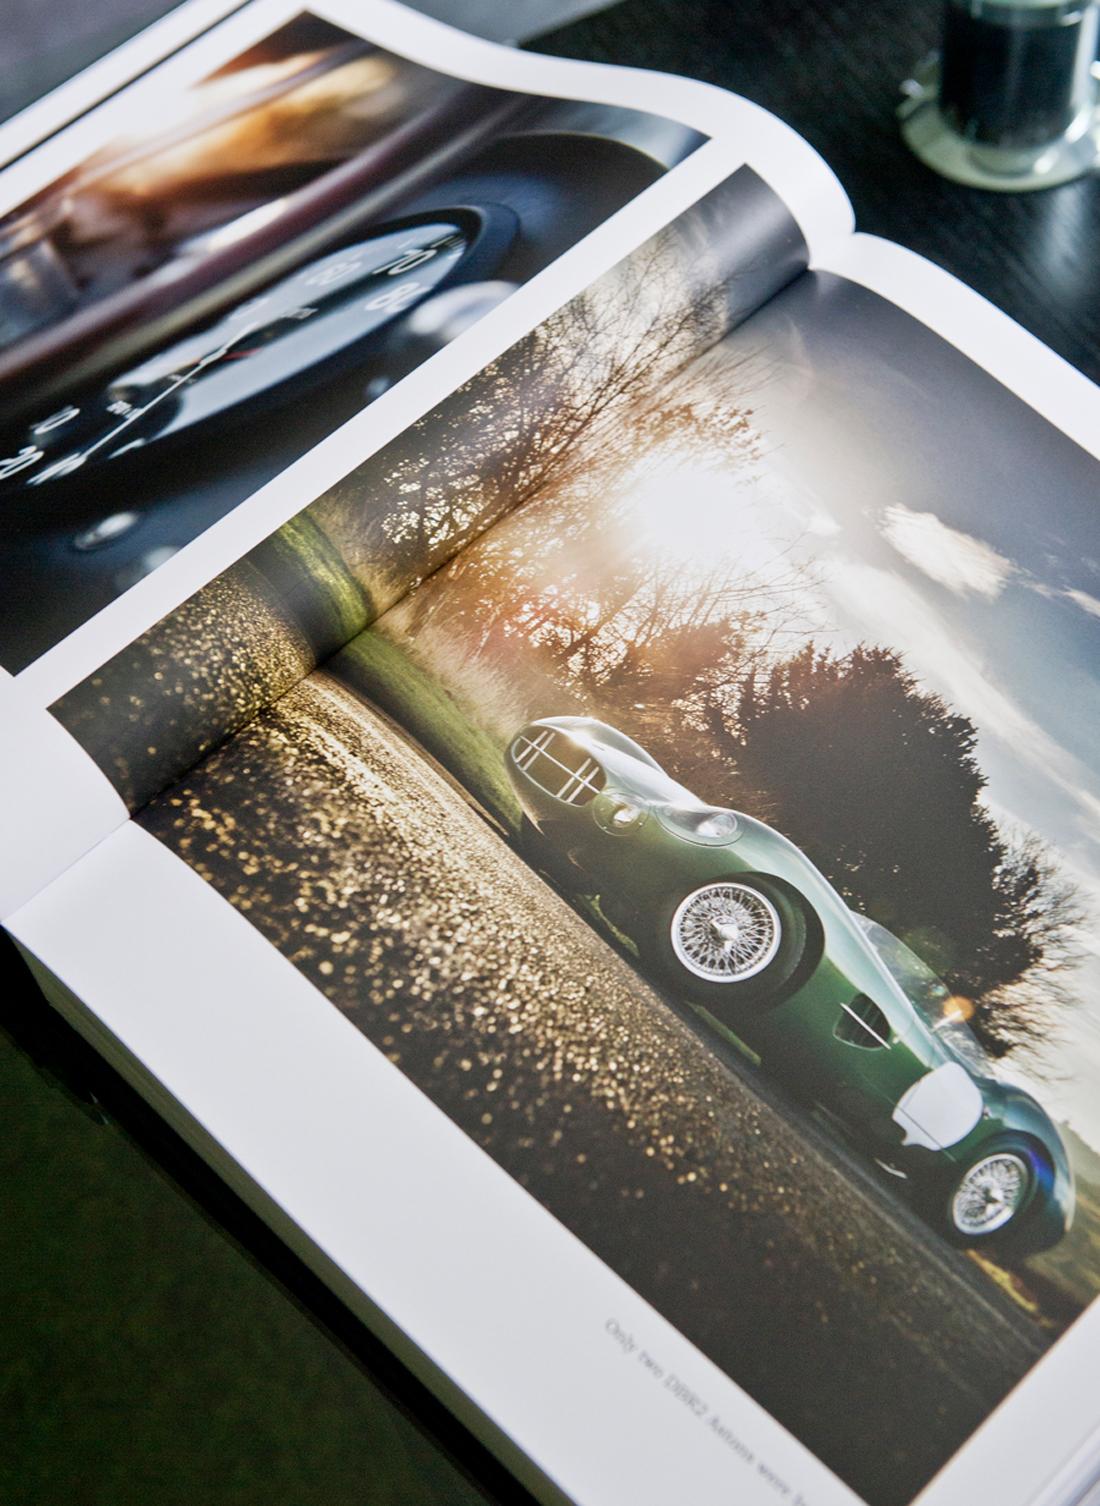 aston martin car, classic car, vintage car, classic car photography, car photographer, photography, car photograph, commercial photography, tim wallace